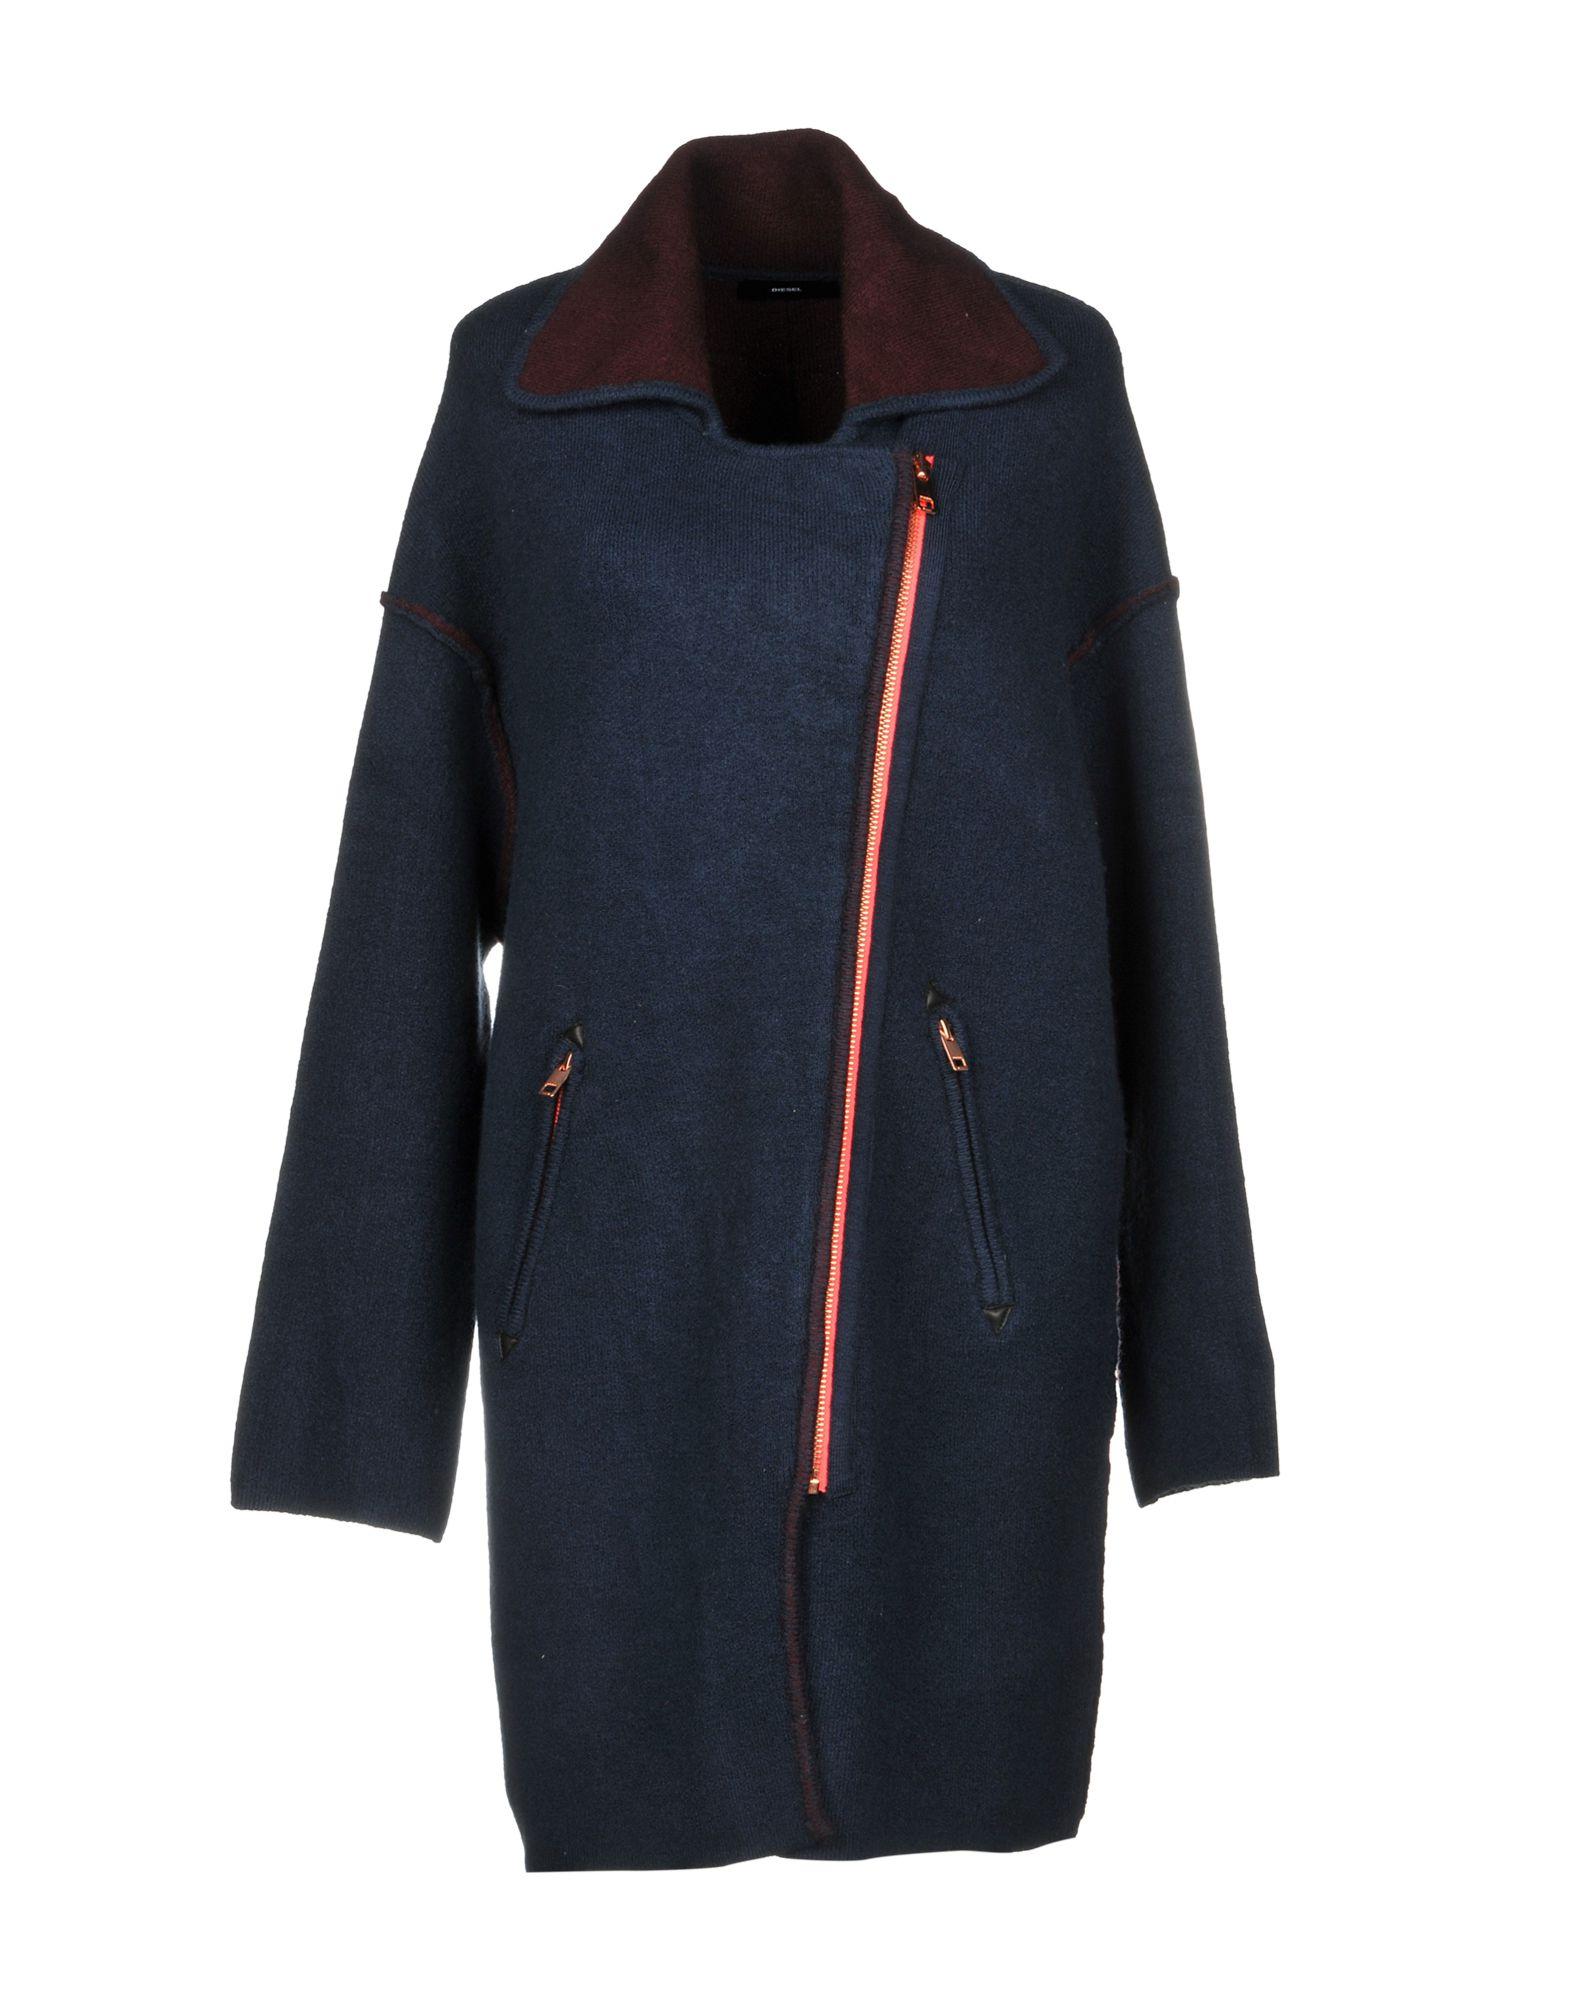 Full-Length Jacket in Dark Blue